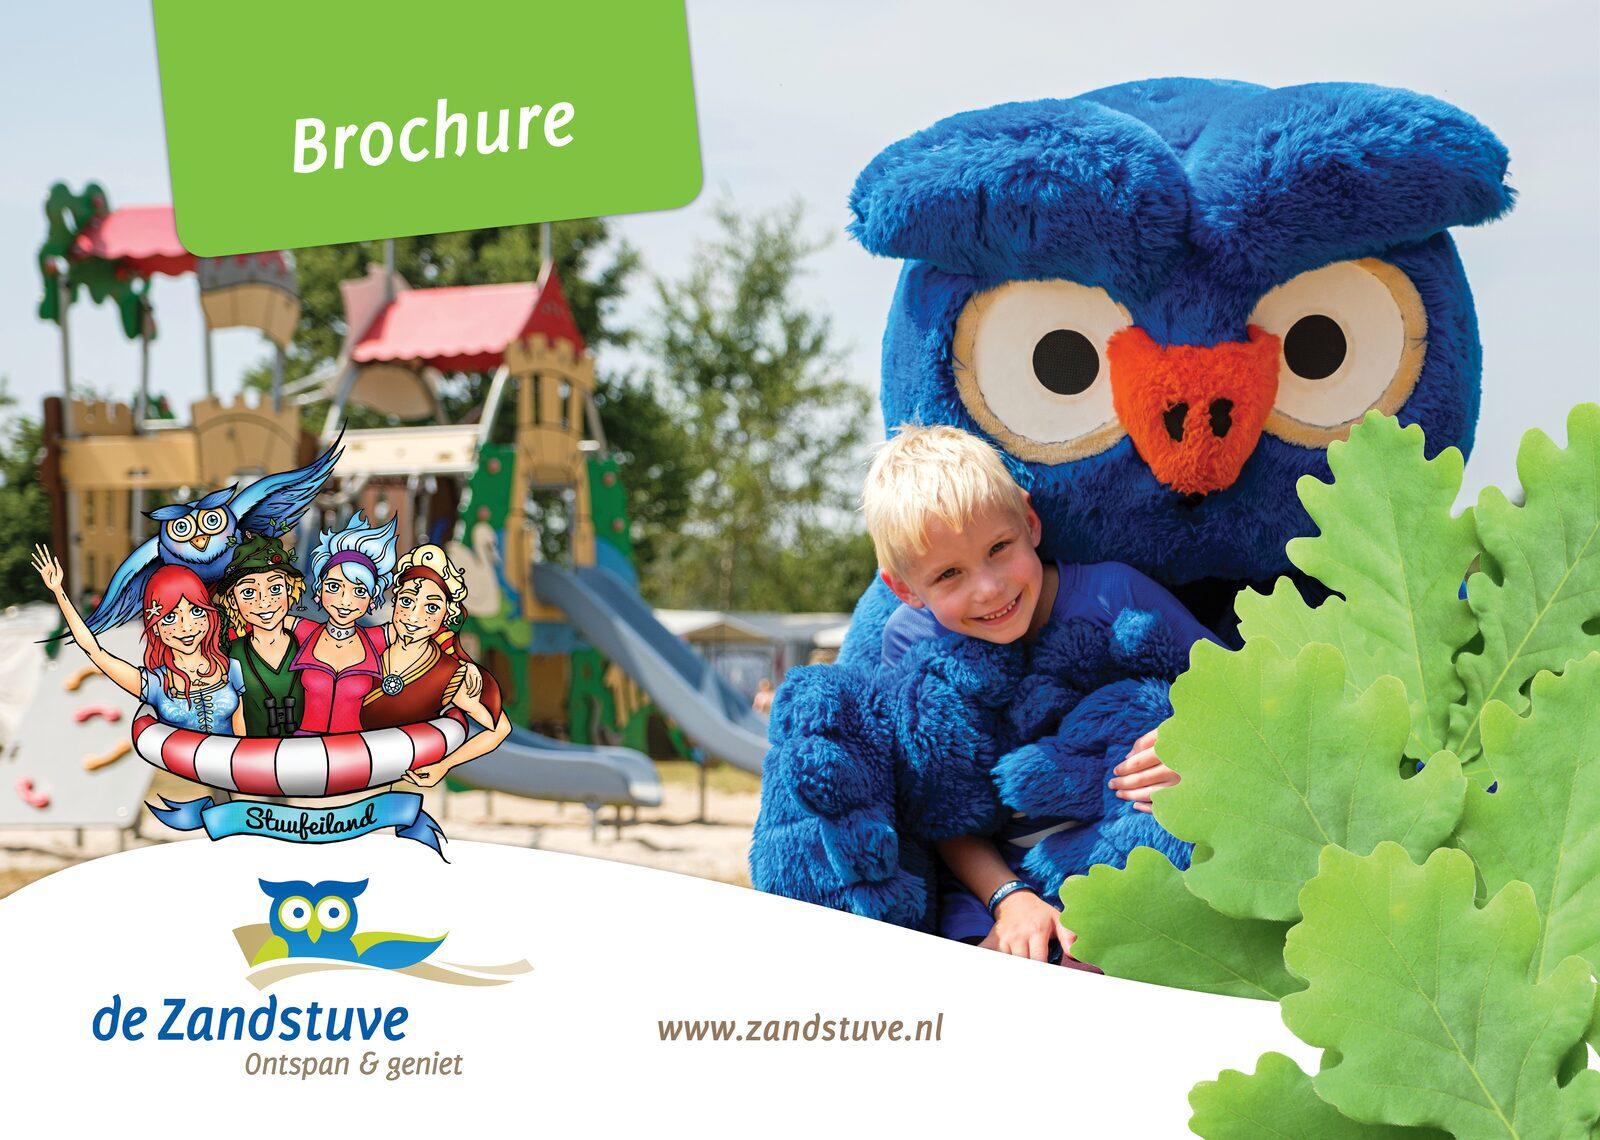 211019_Zandstuve_Brochure_2020_NL_f38c6f90-2b89-4b6b-9e6a-c827a32103a9.pdf